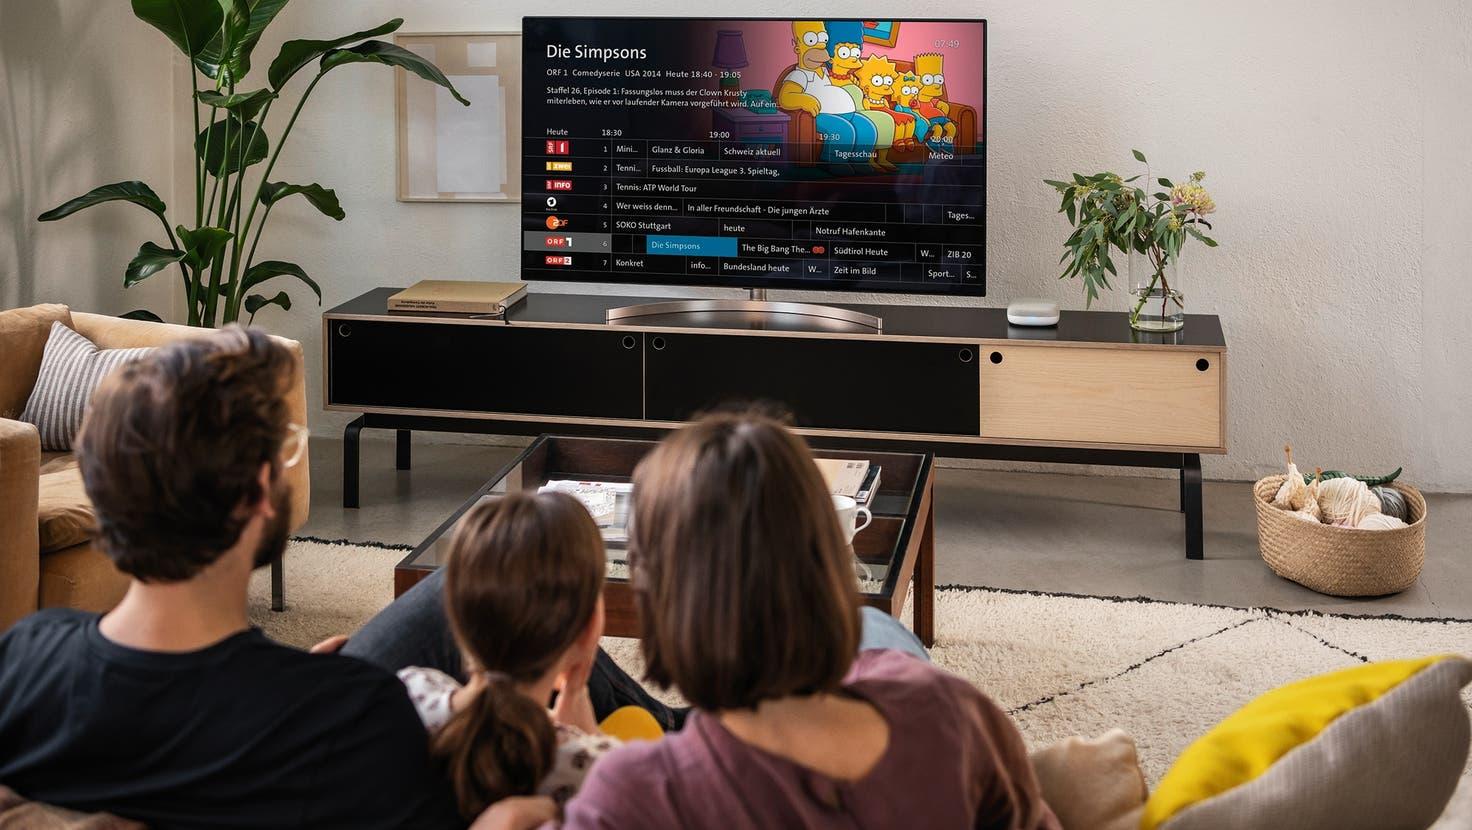 Die Swisscom lanciert ihr TV-Angebot neu. (Swisscom)